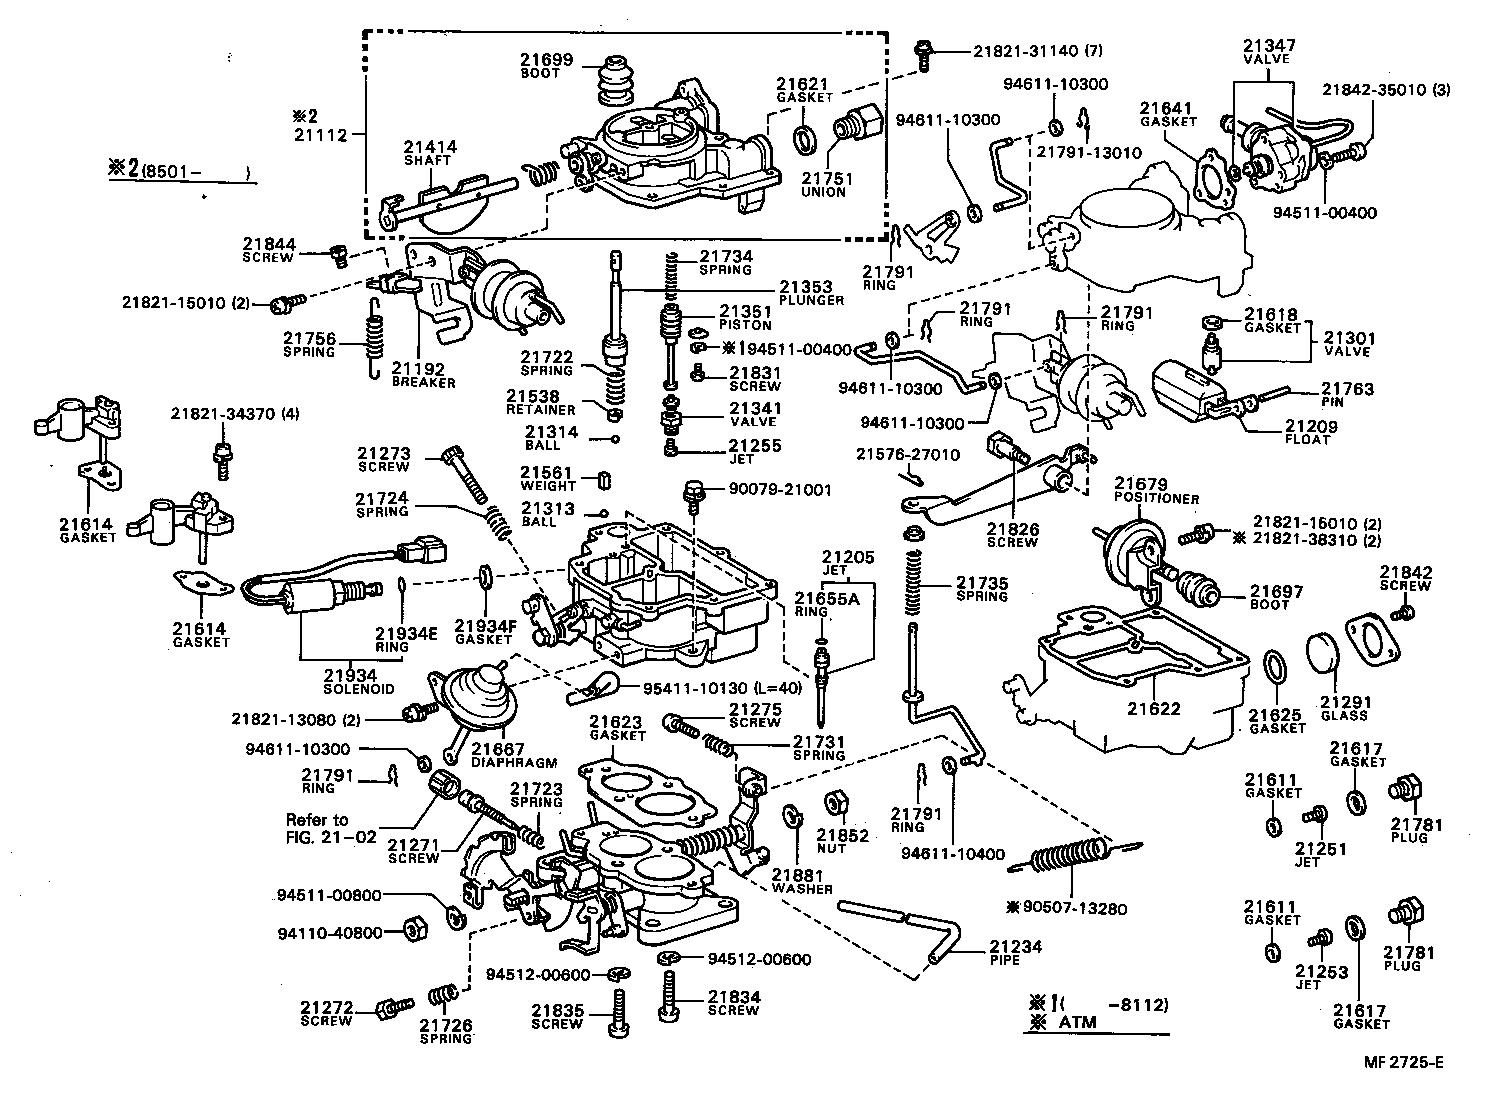 1989 Toyota Corolla Carburetor Diagram Trusted Wiring Diagrams 1988 Jeep Wrangler Corollake70 Eekns Tool Engine Fuel Japan